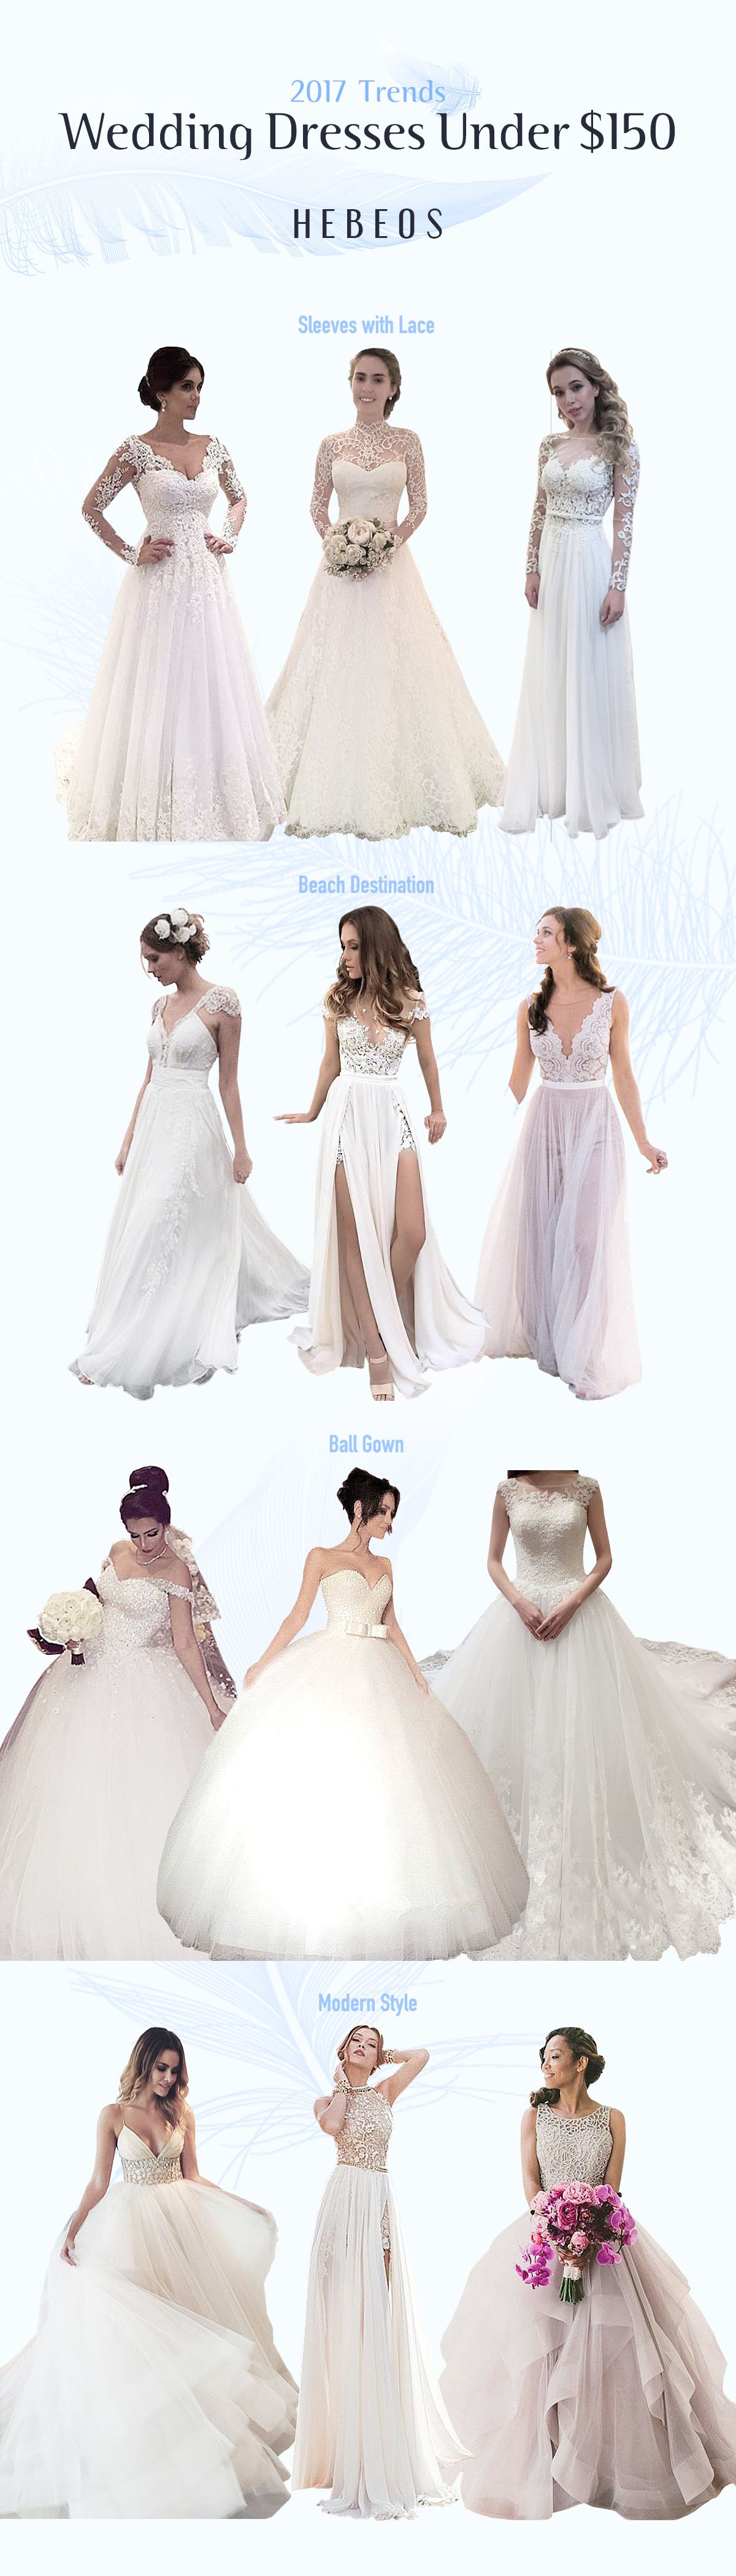 Unique style wedding dresses  Hebeos wedding dresses  autumn sale Cheap wedding dresses for